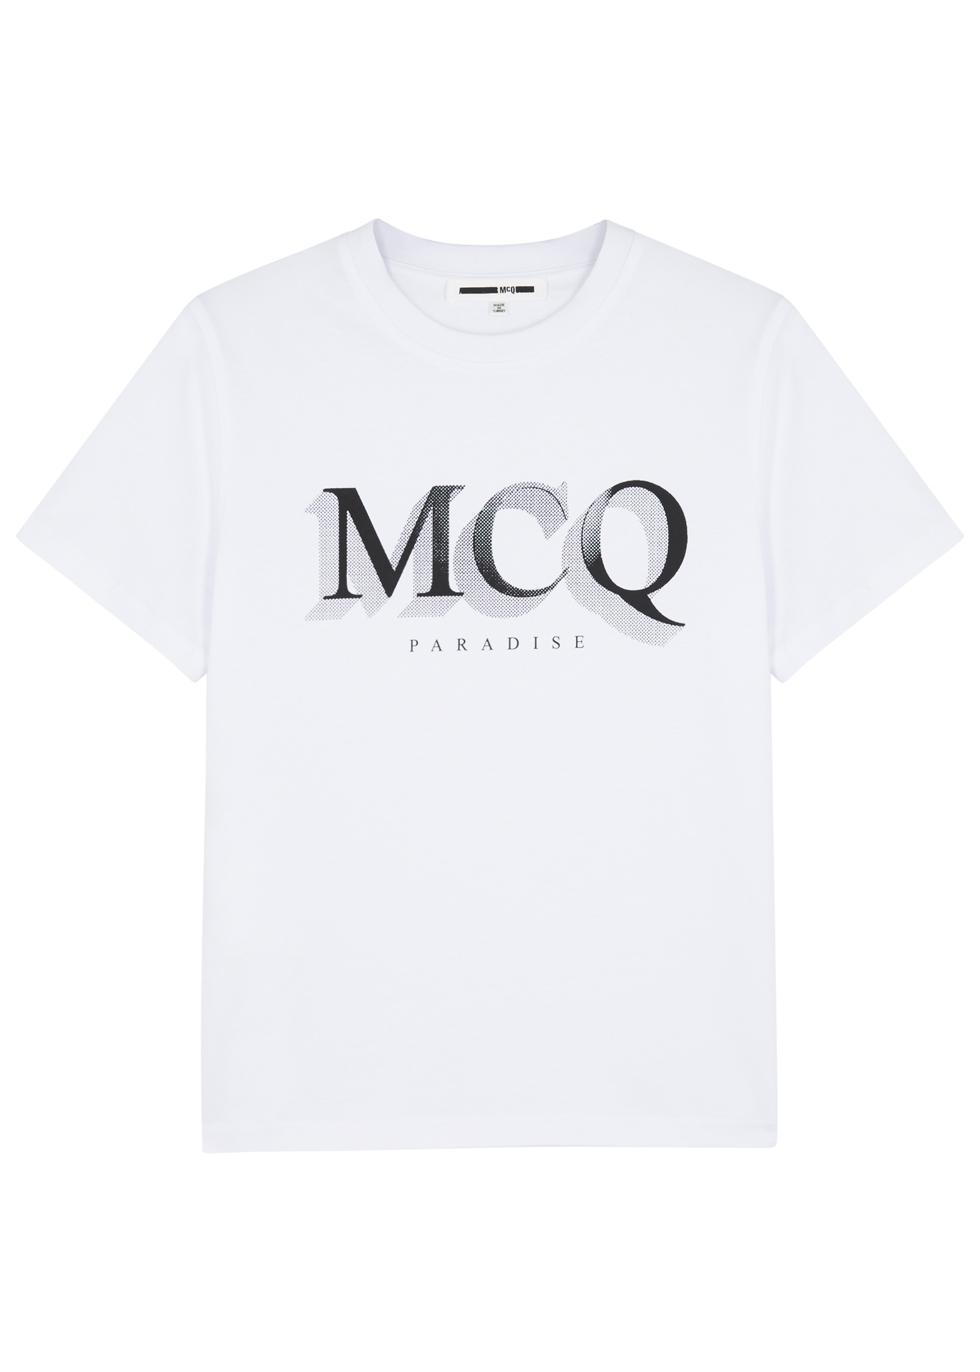 MCQ BY ALEXANDER MCQUEEN WHITE LOGO-PRINT COTTON T-SHIRT